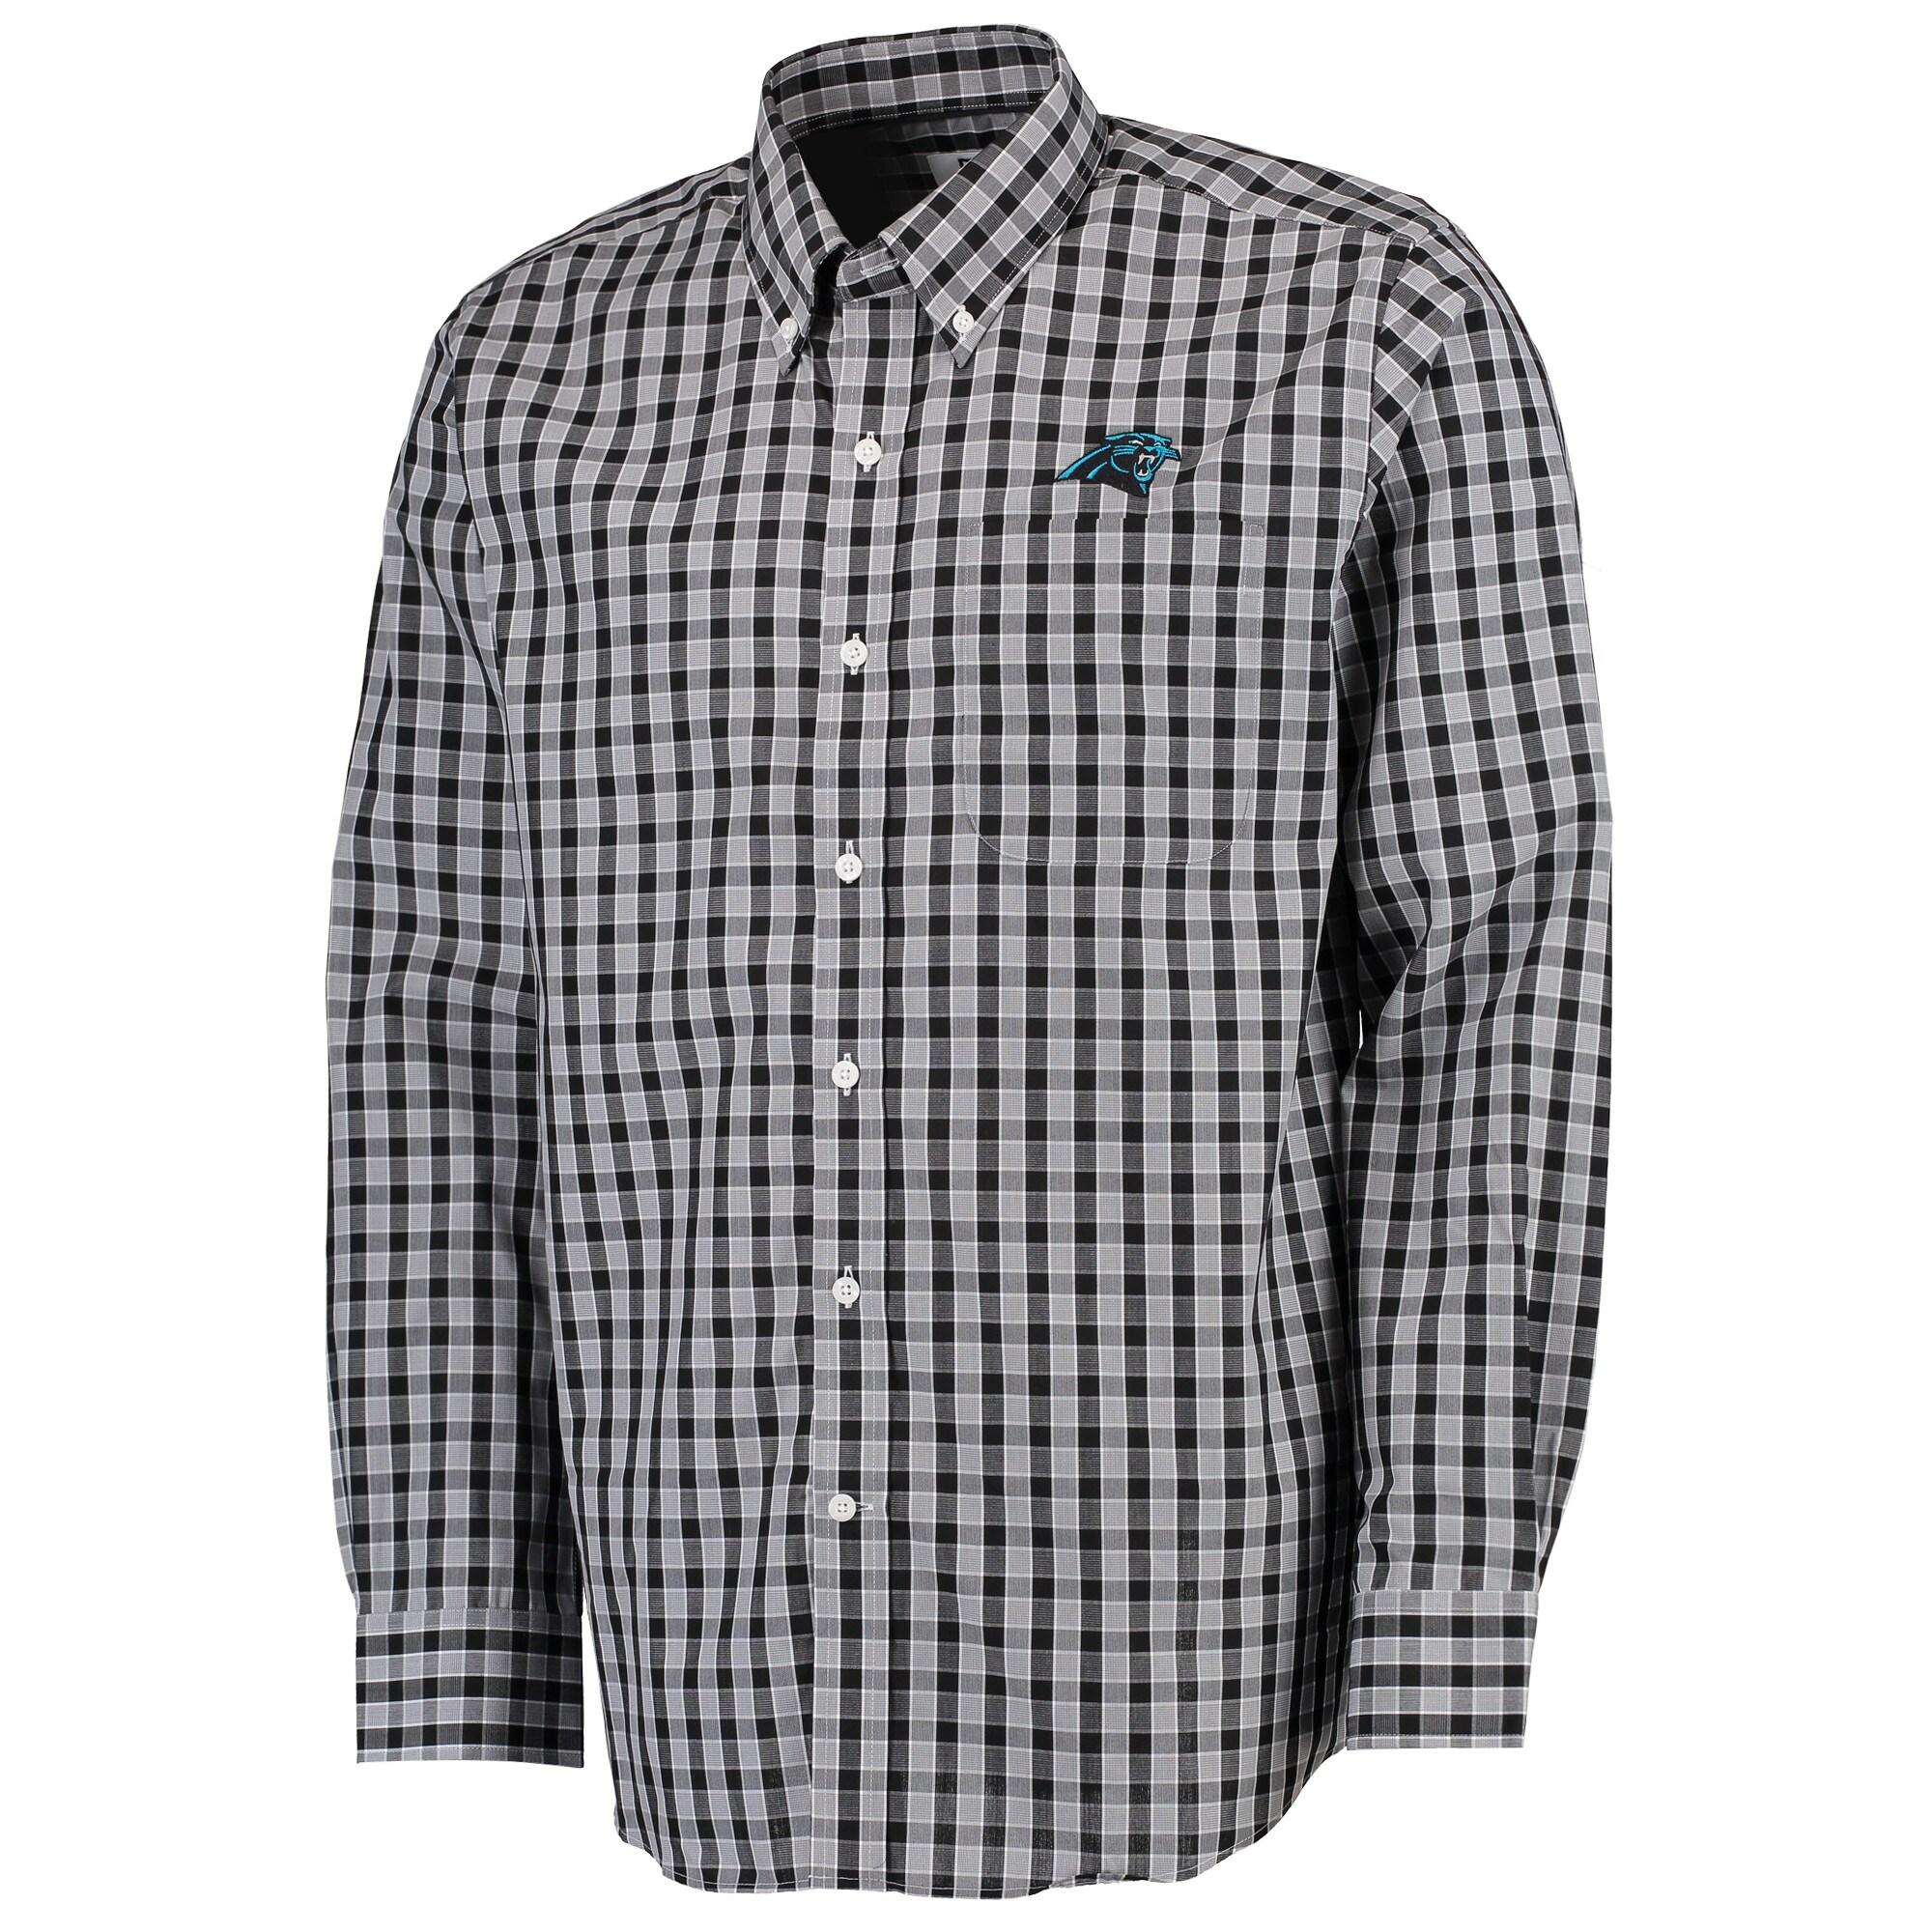 Carolina Panthers Cutter & Buck Discovery Park Plaid Long Sleeve Woven Shirt - Black